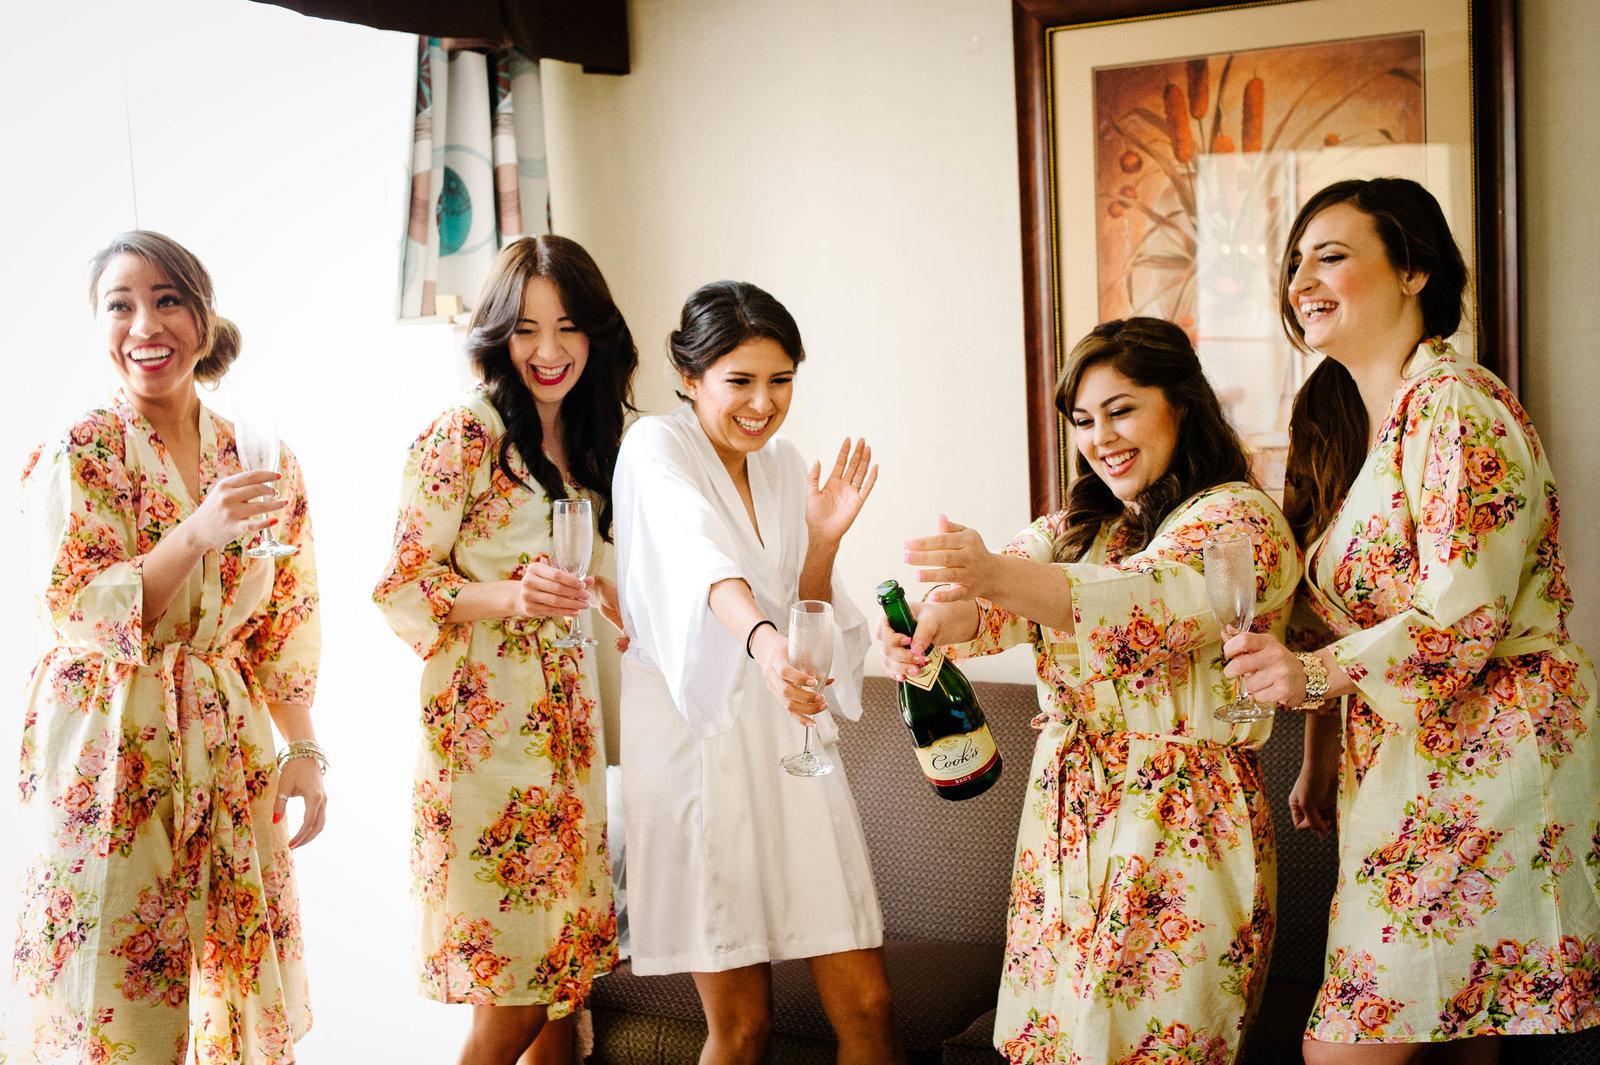 150-El-paso-wedding-photographer-El Paso Wedding Photographer_M19